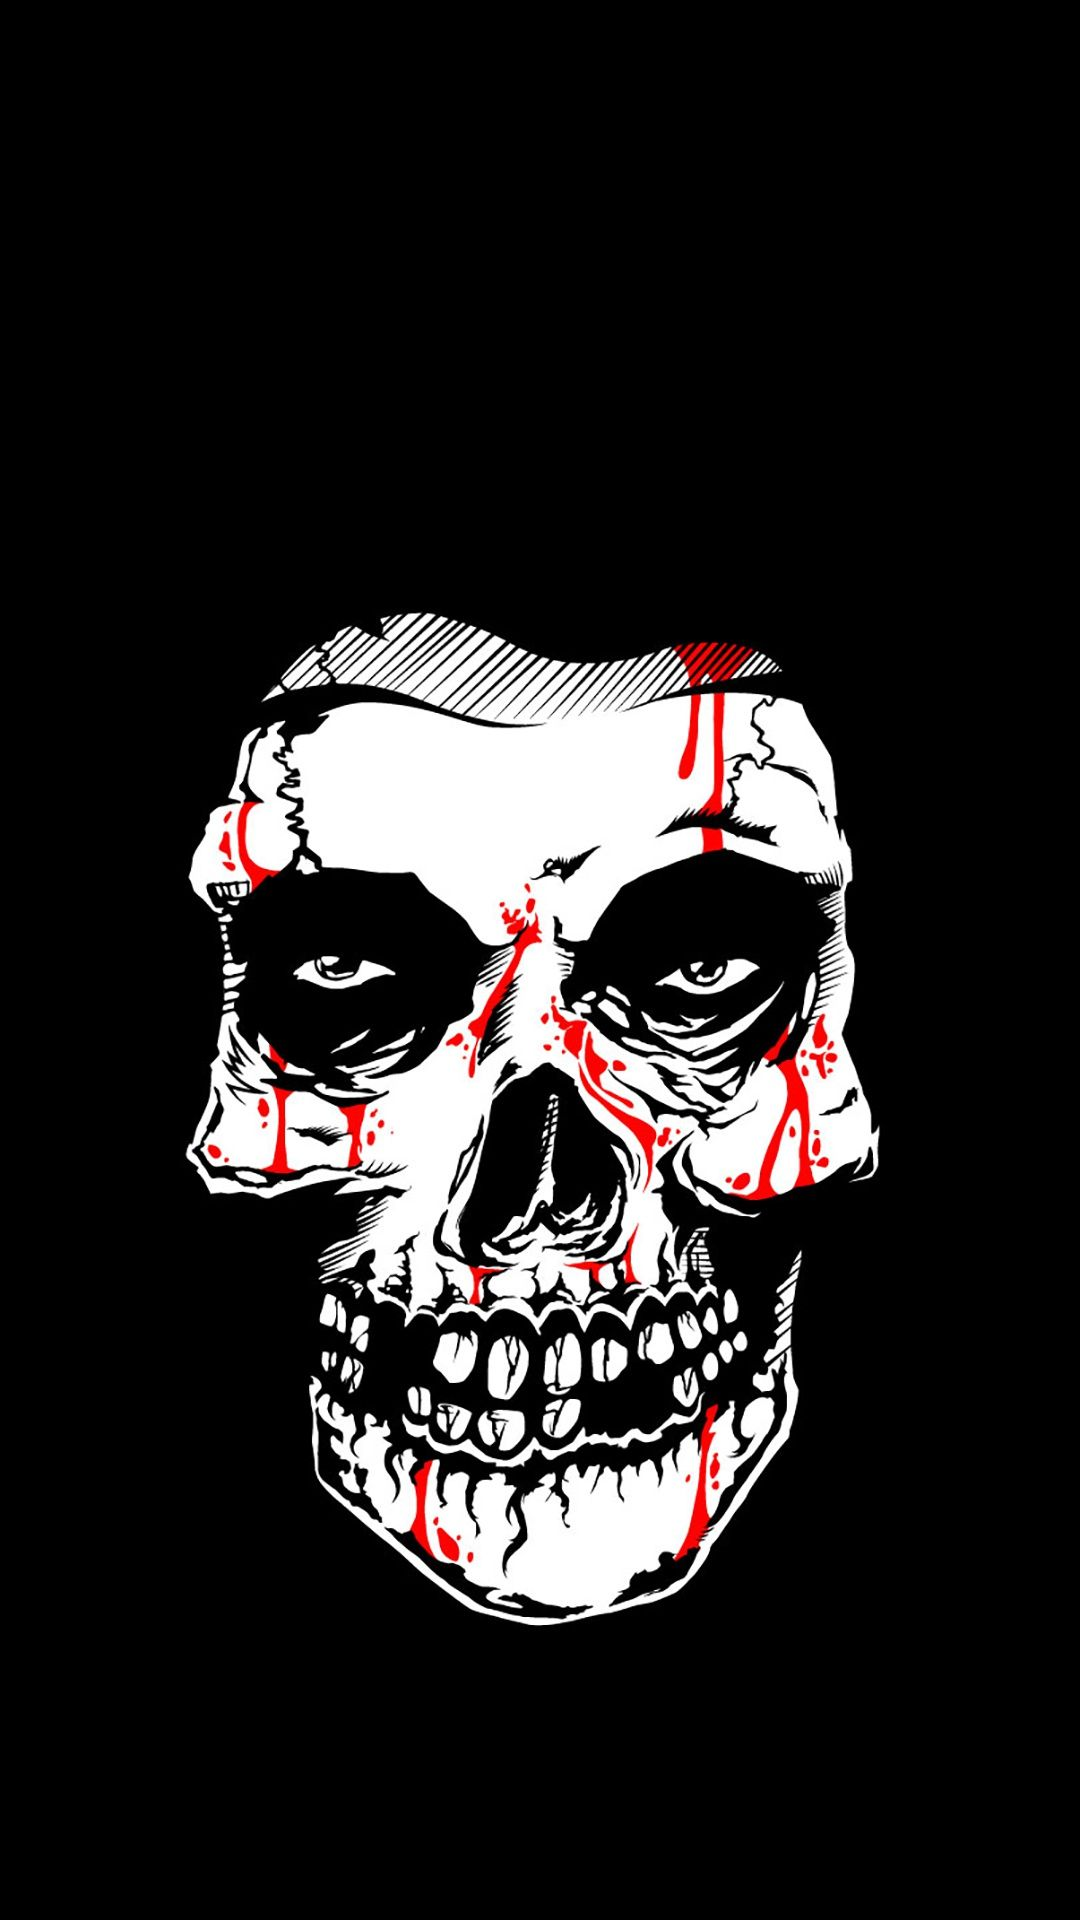 Pin By Diego Perez On Tattoo Skull Wallpaper Dark Wallpaper Wallpaper